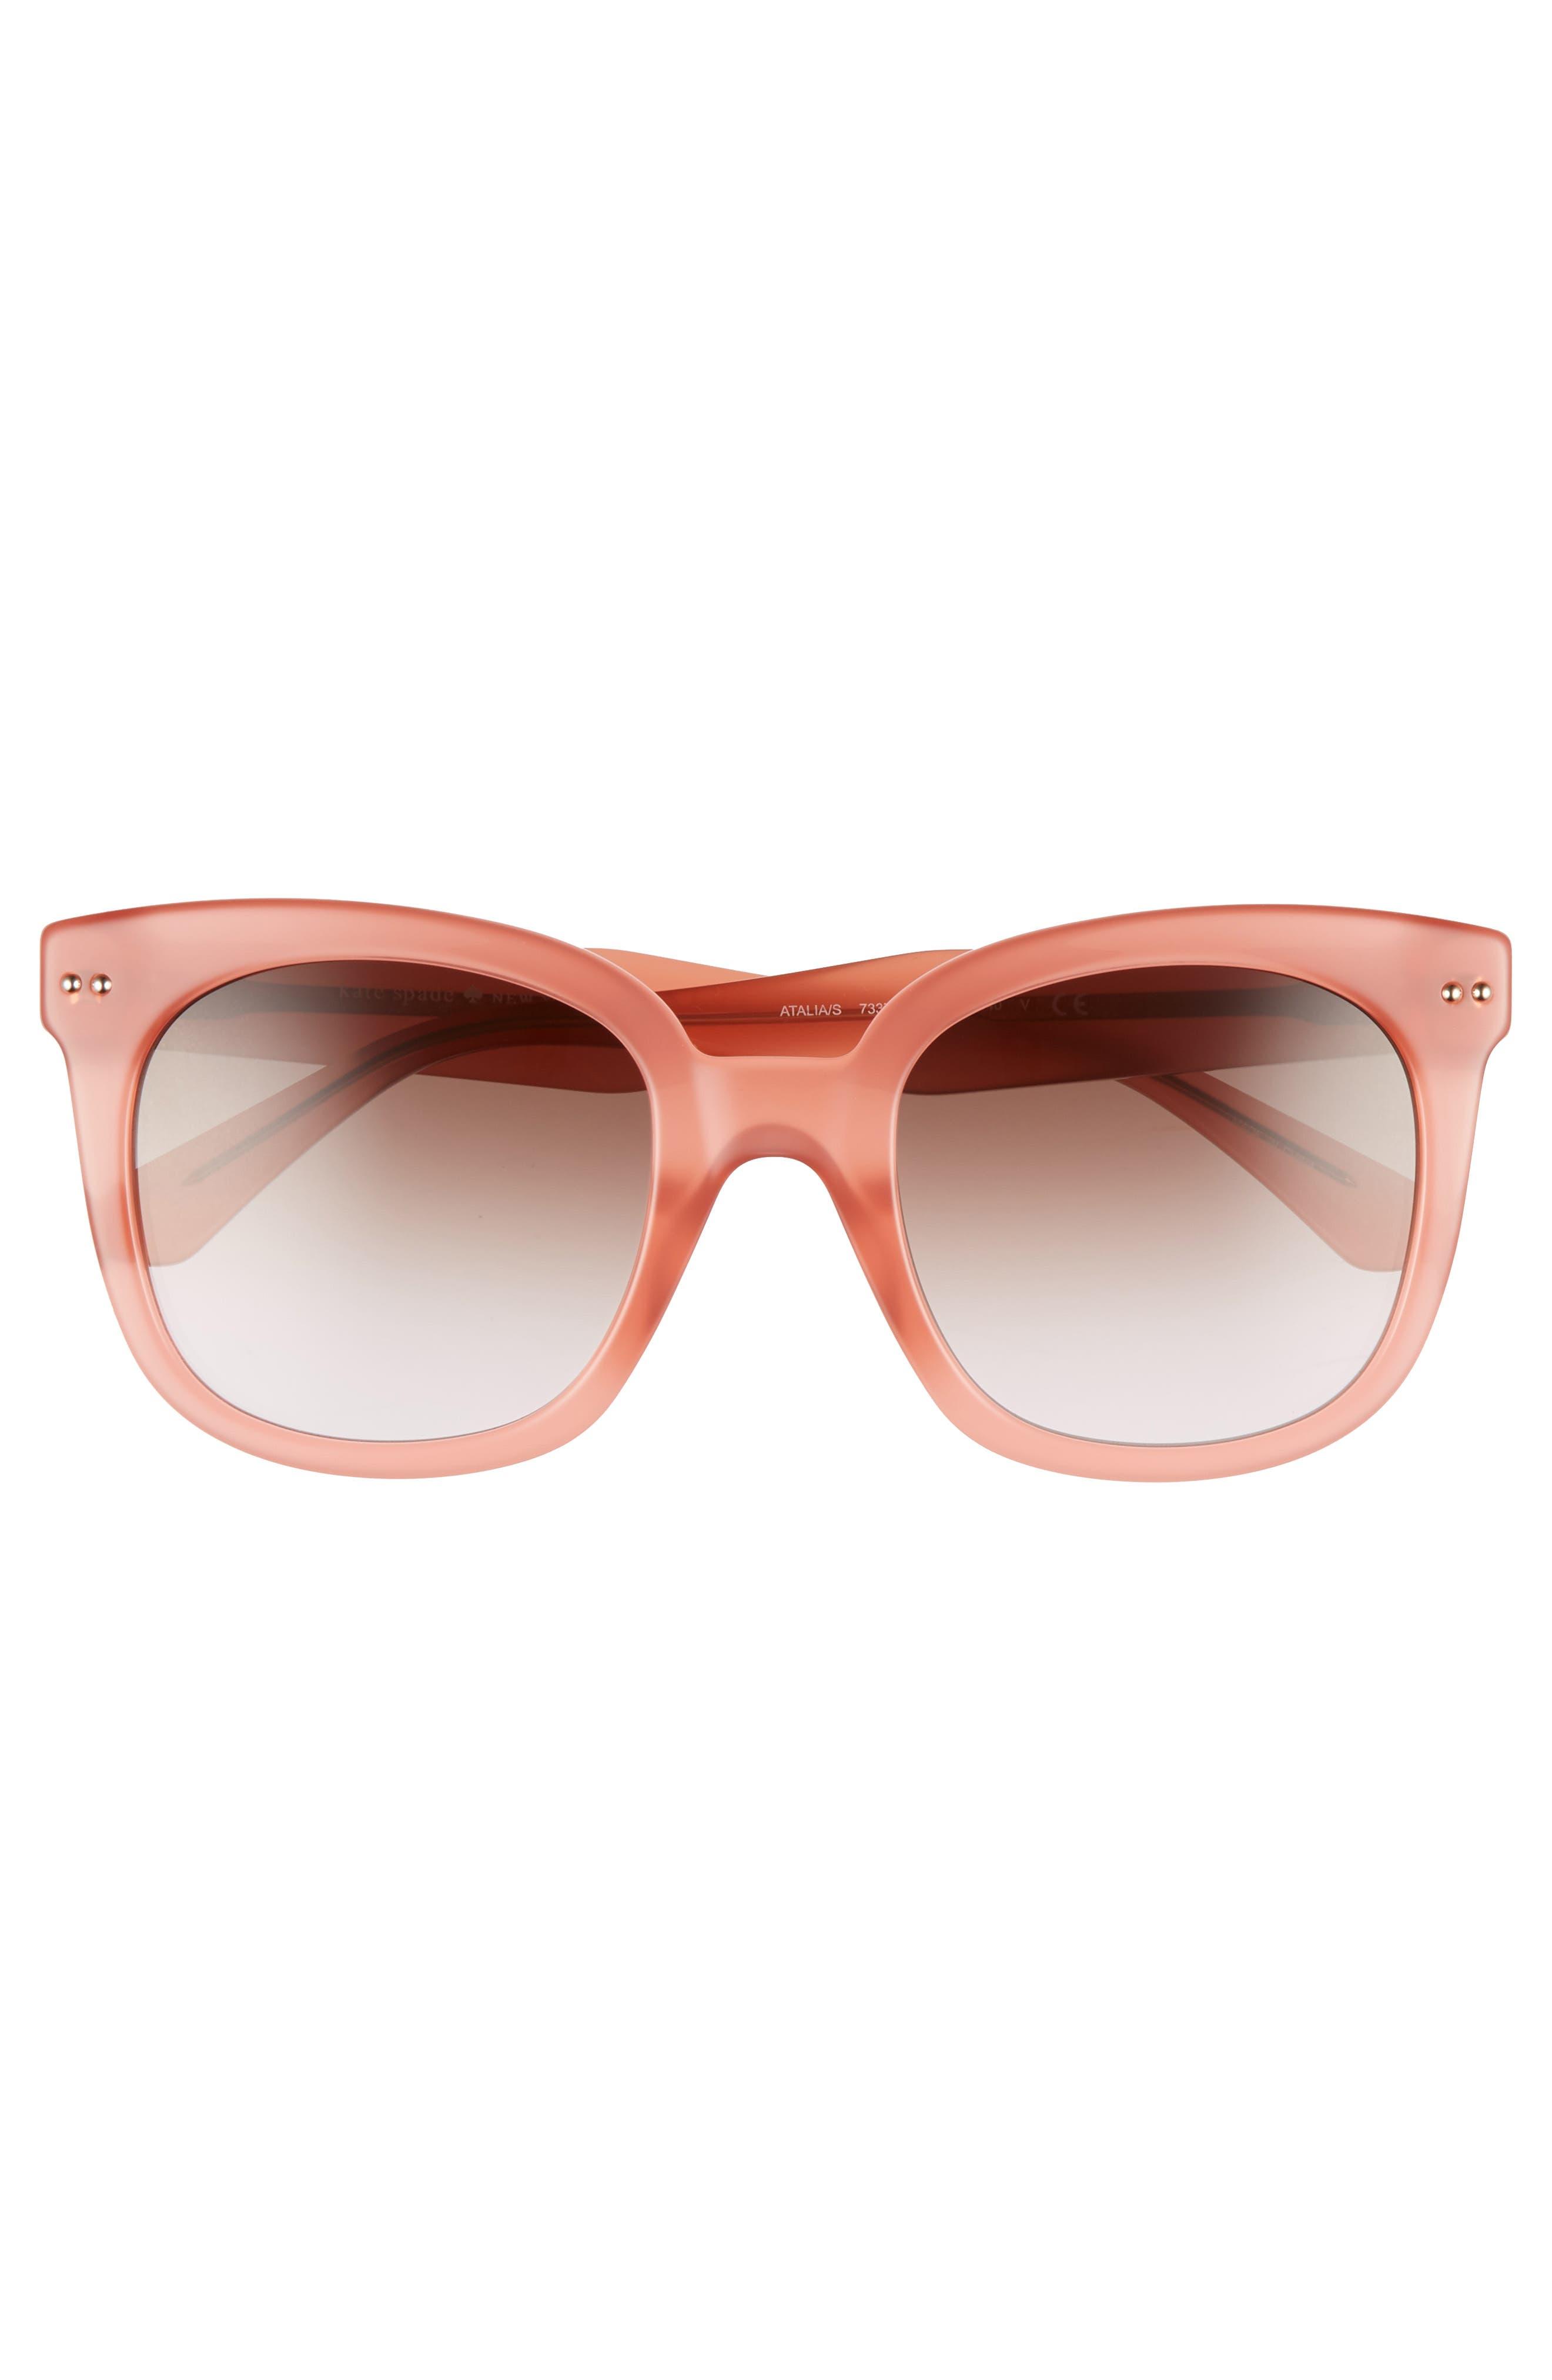 atalias 52mm square sunglasses,                             Alternate thumbnail 3, color,                             Peach